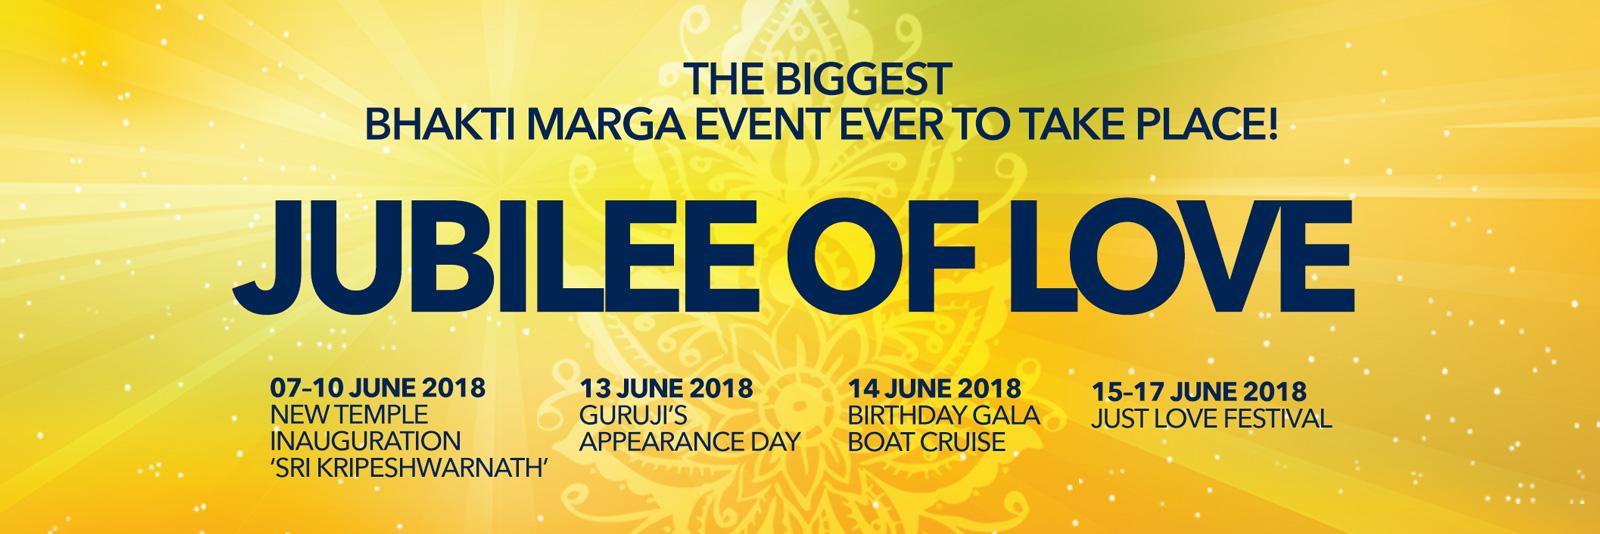 JubileeOfLove-BhaktiMarga